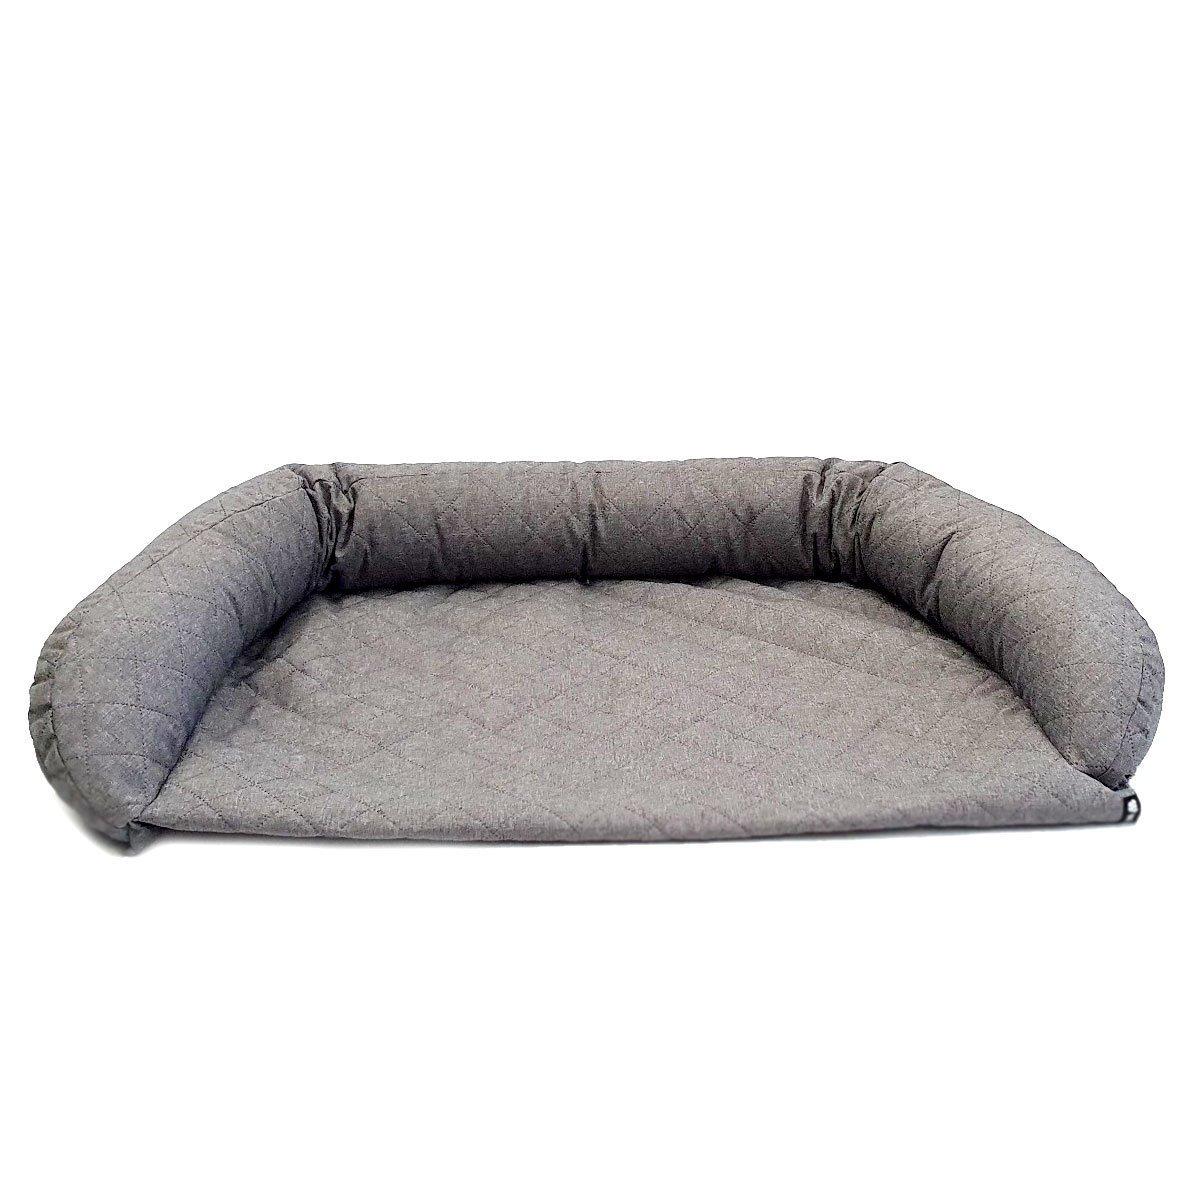 wauweich Sofa Hundebett Hundedecke, Bild 7